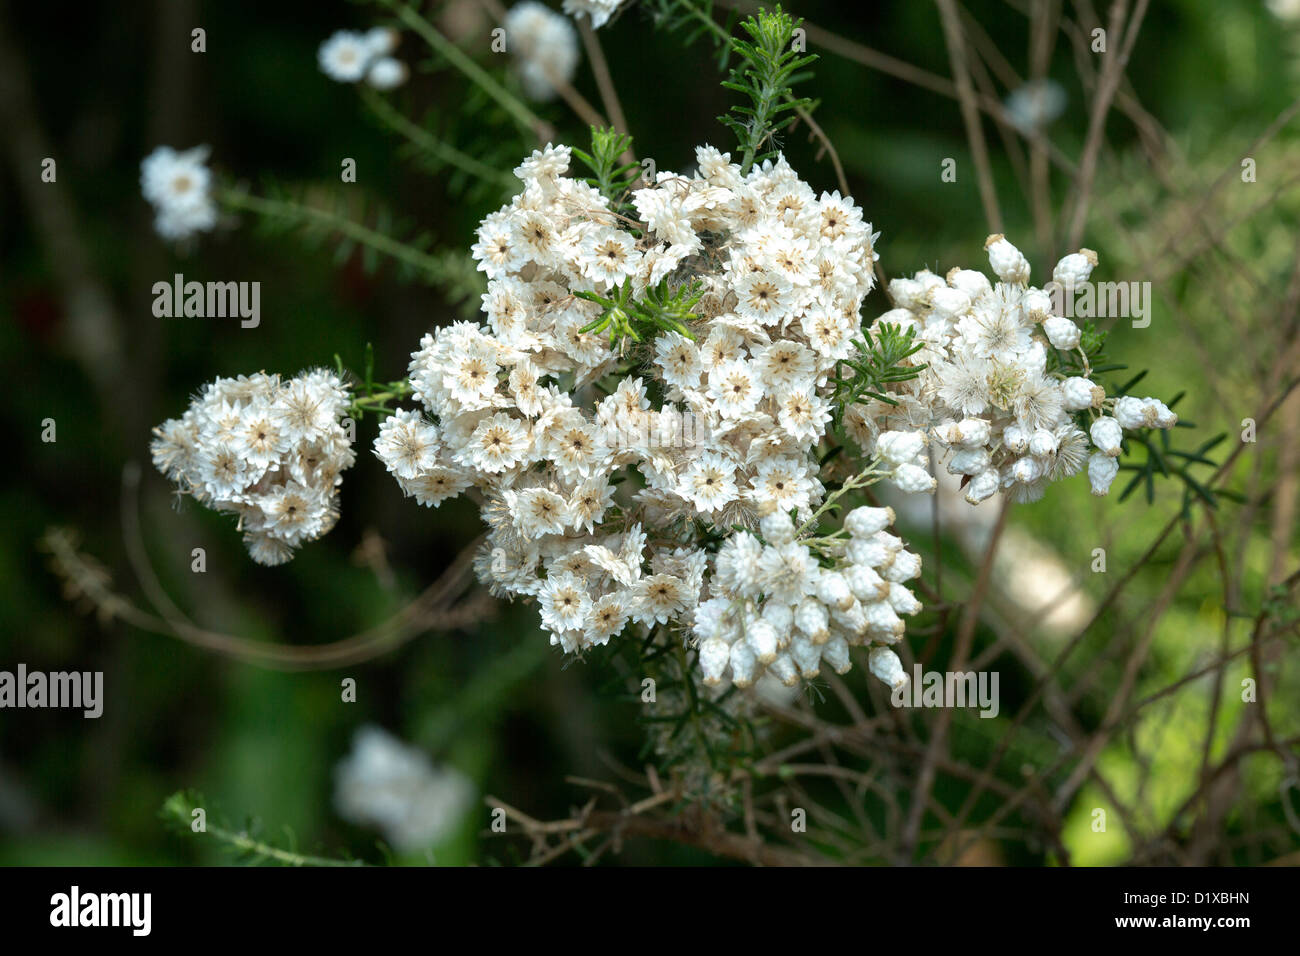 Cluster White Flowers Foliage Australian Stock Photos Cluster